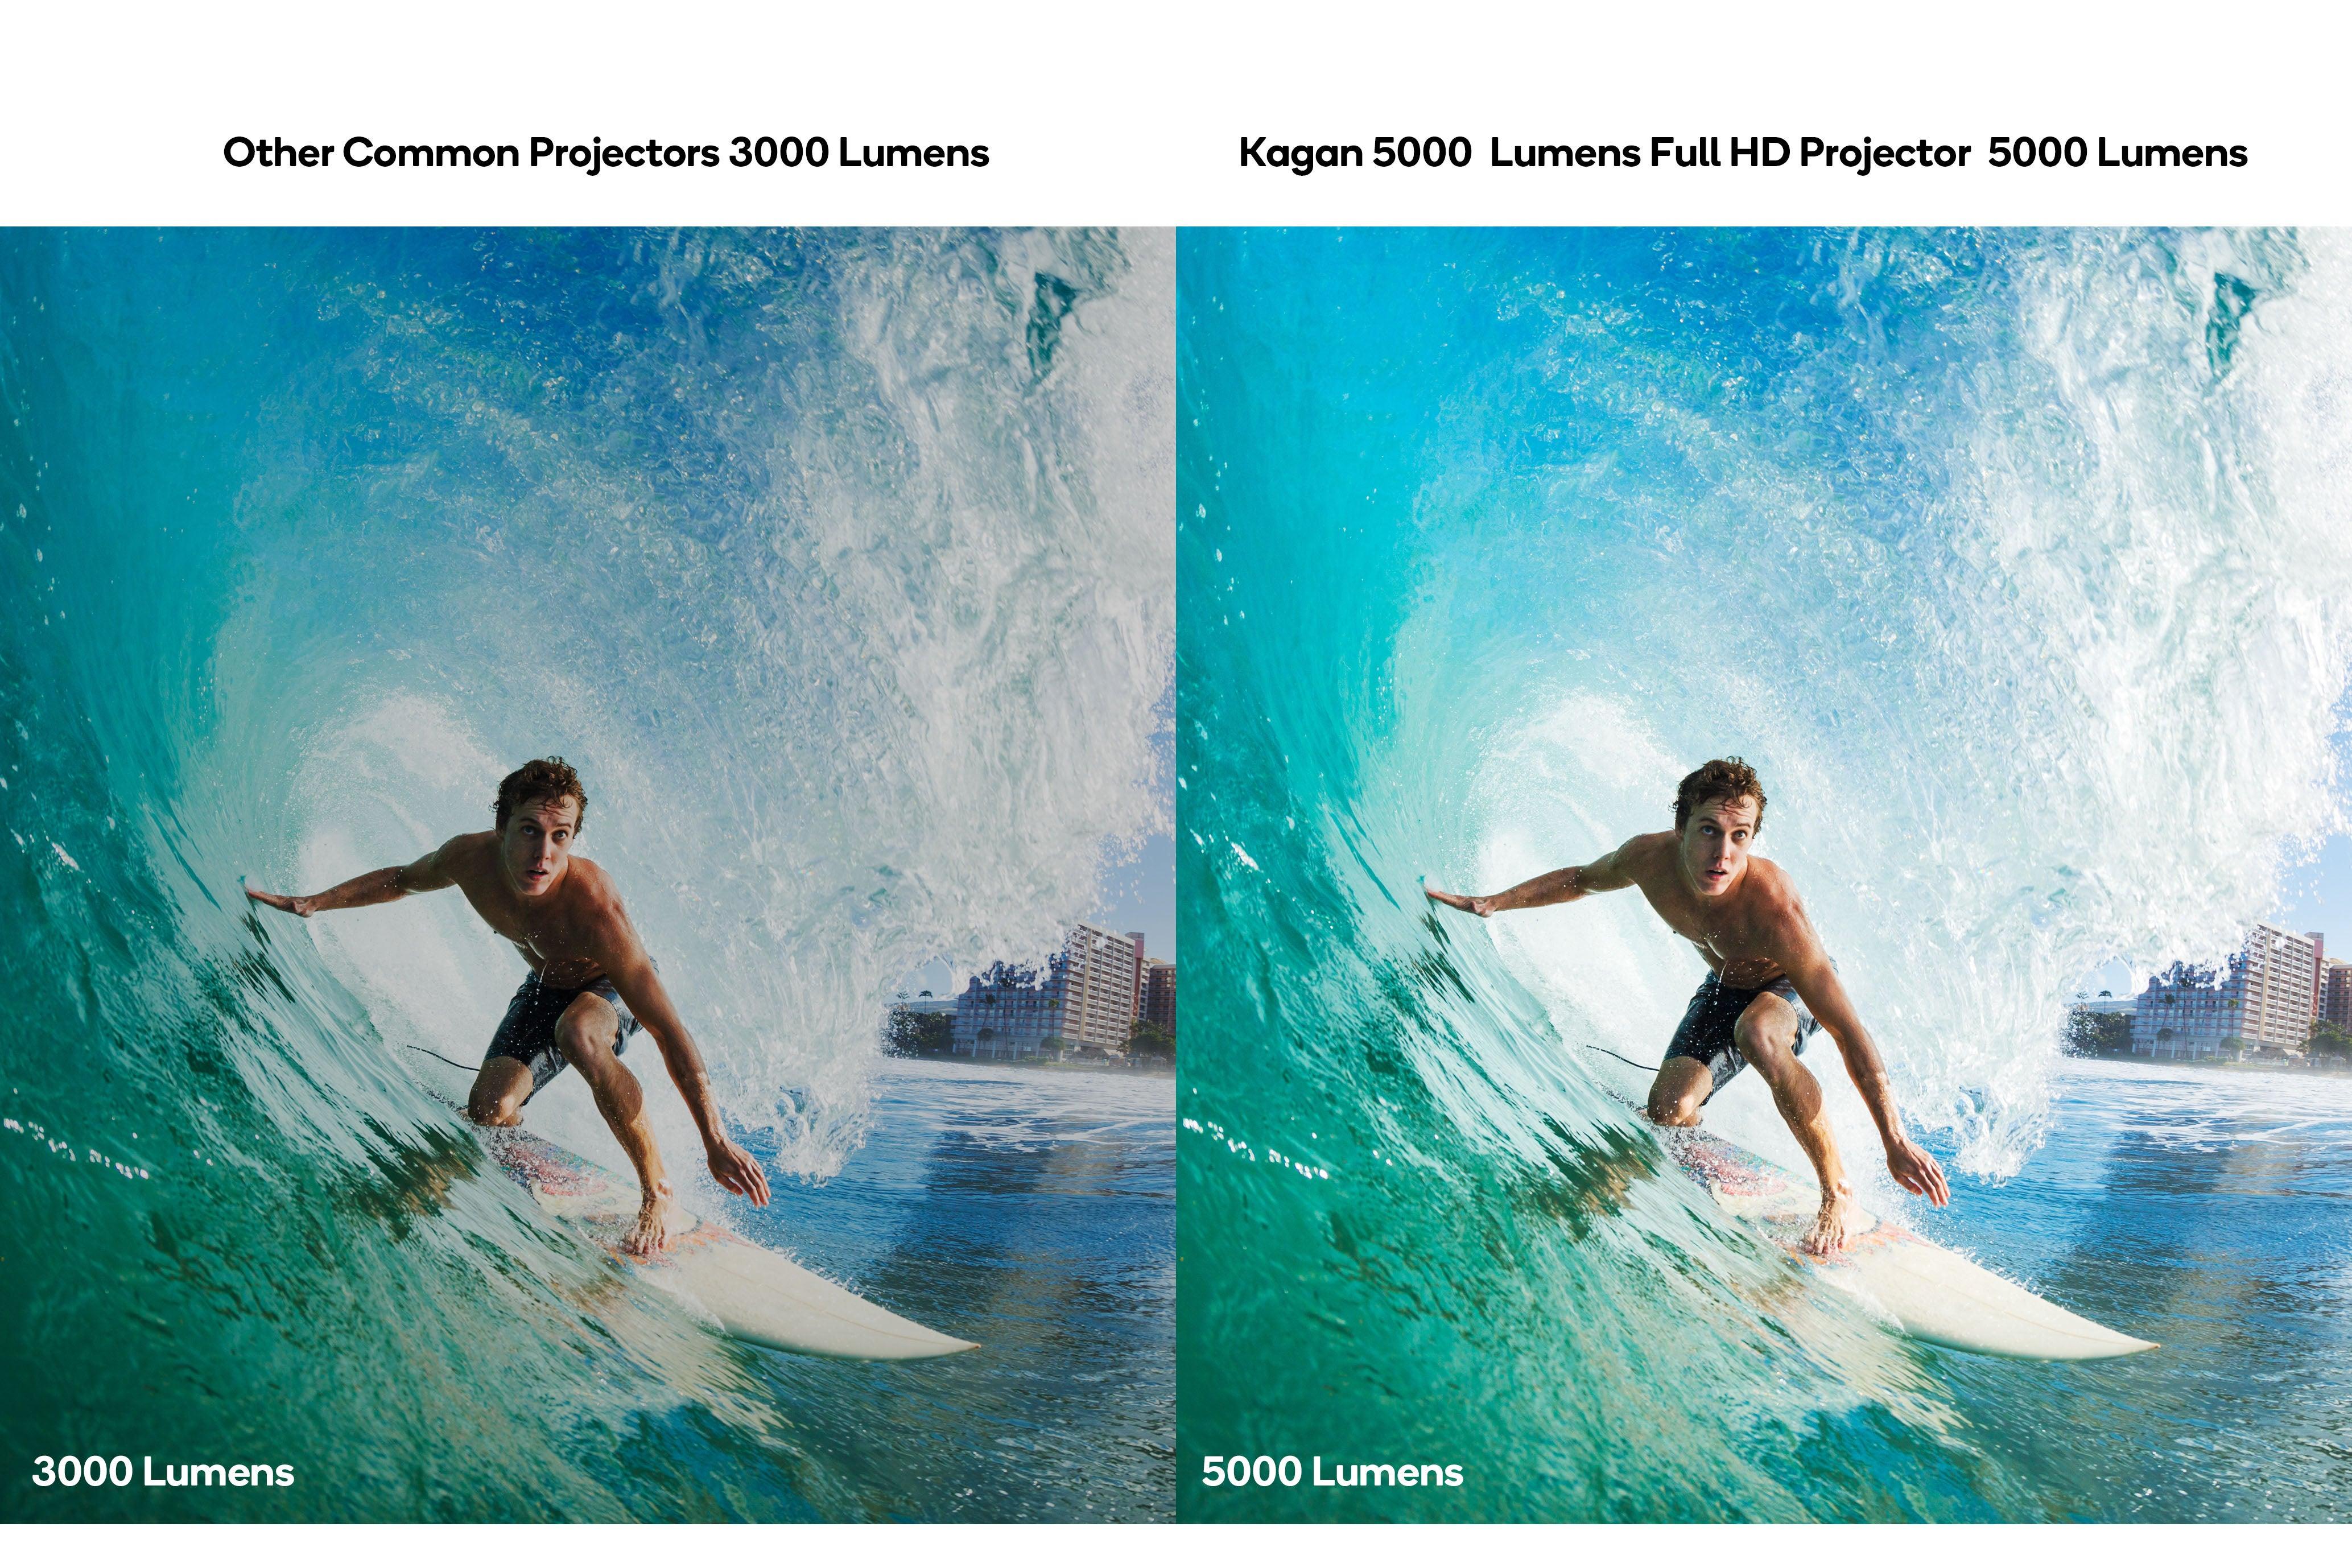 Kogan 5000 Lumens Full HD Projector (F800) Projection Size